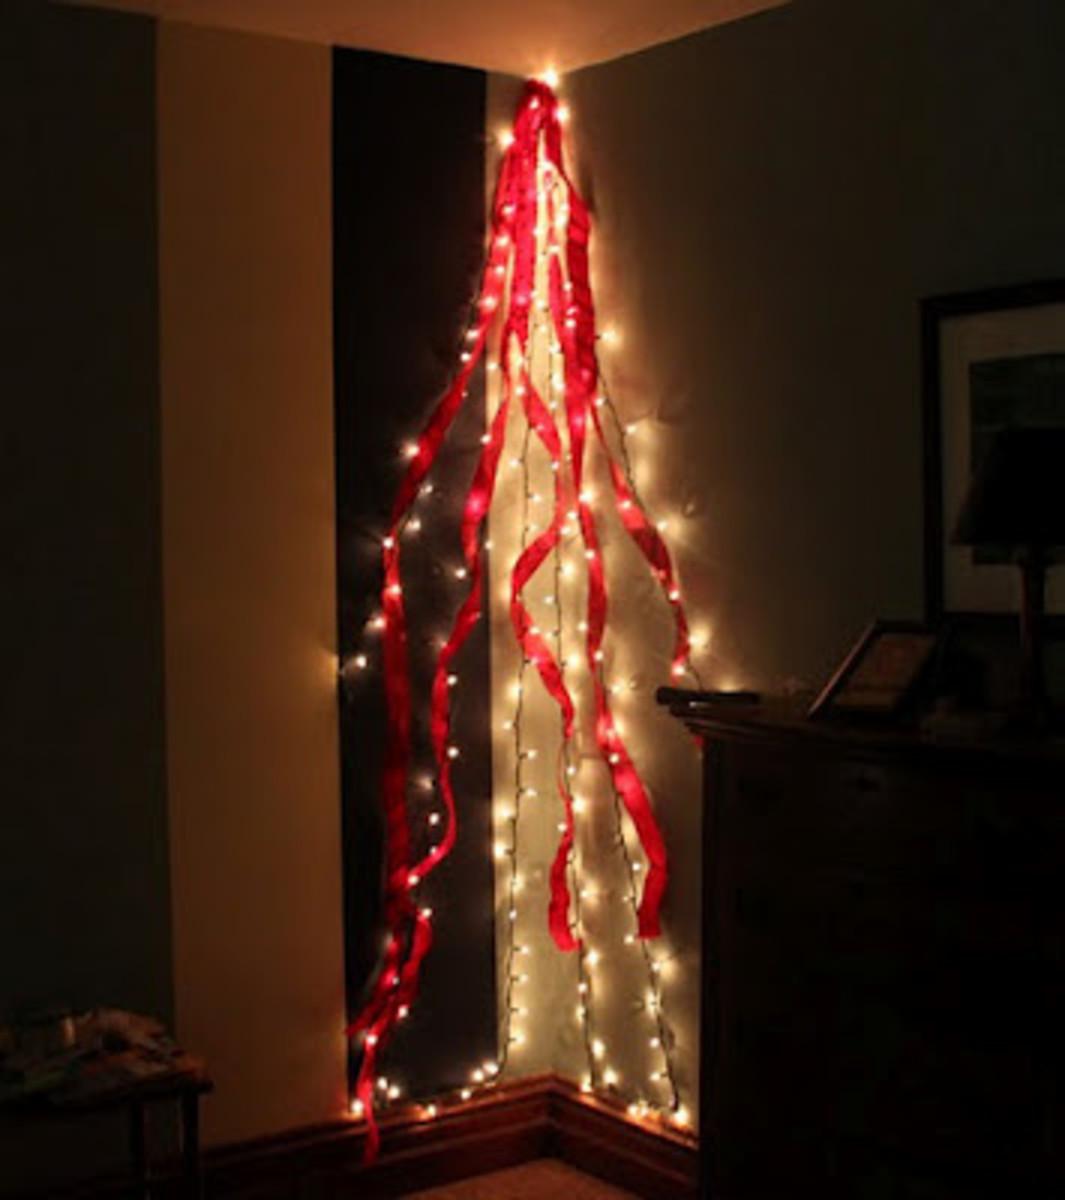 Lights/Ribbons